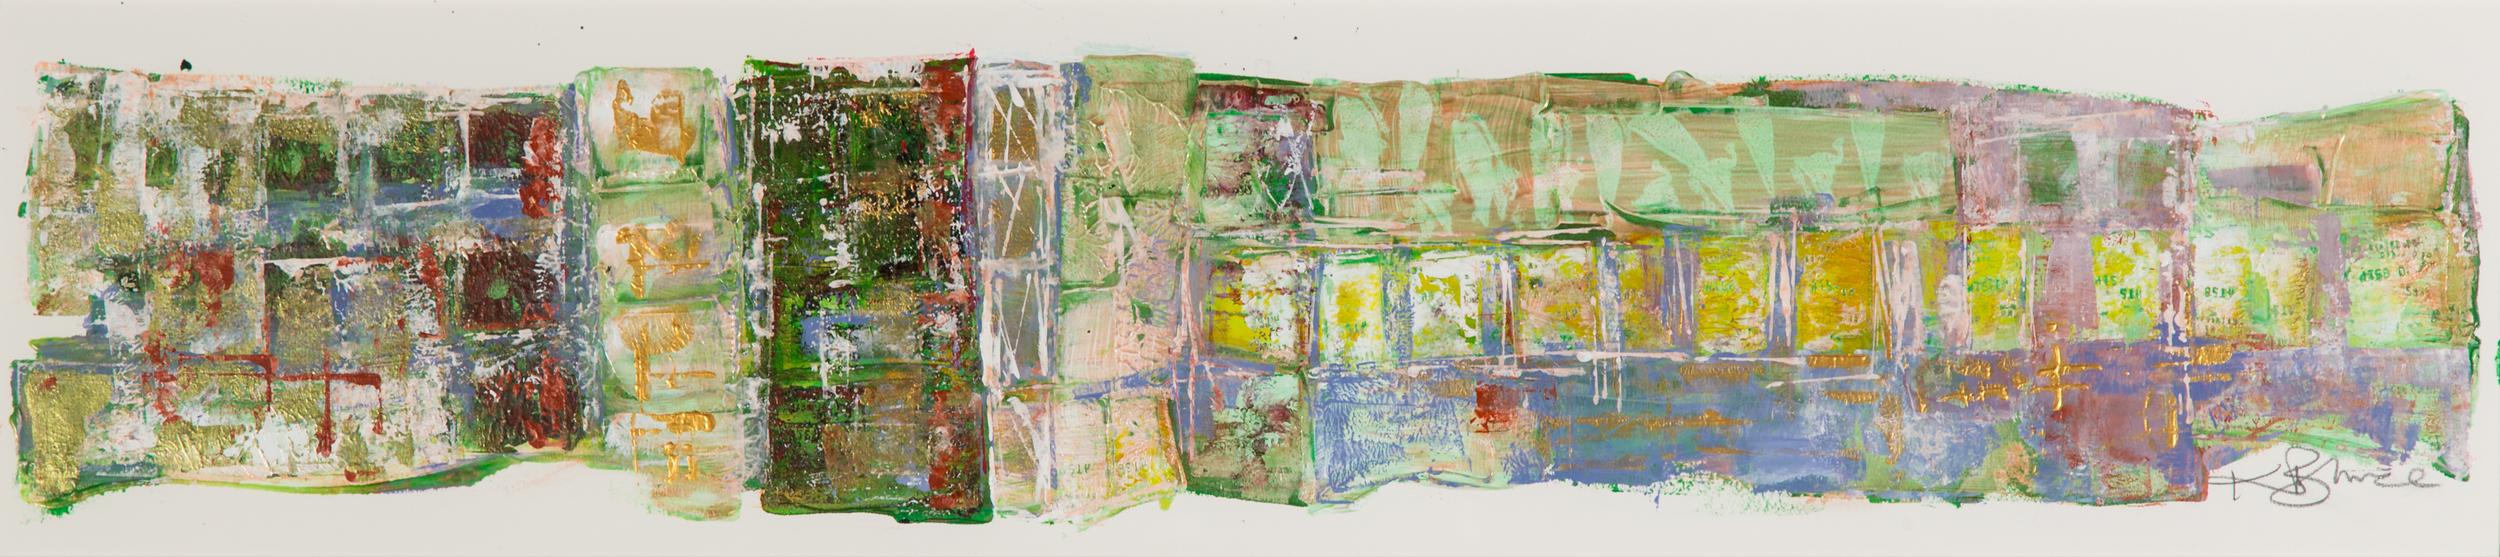 KB-067, Killarney Crowds, Acrylic on Paper, 2015, 46 x 10, $2,350